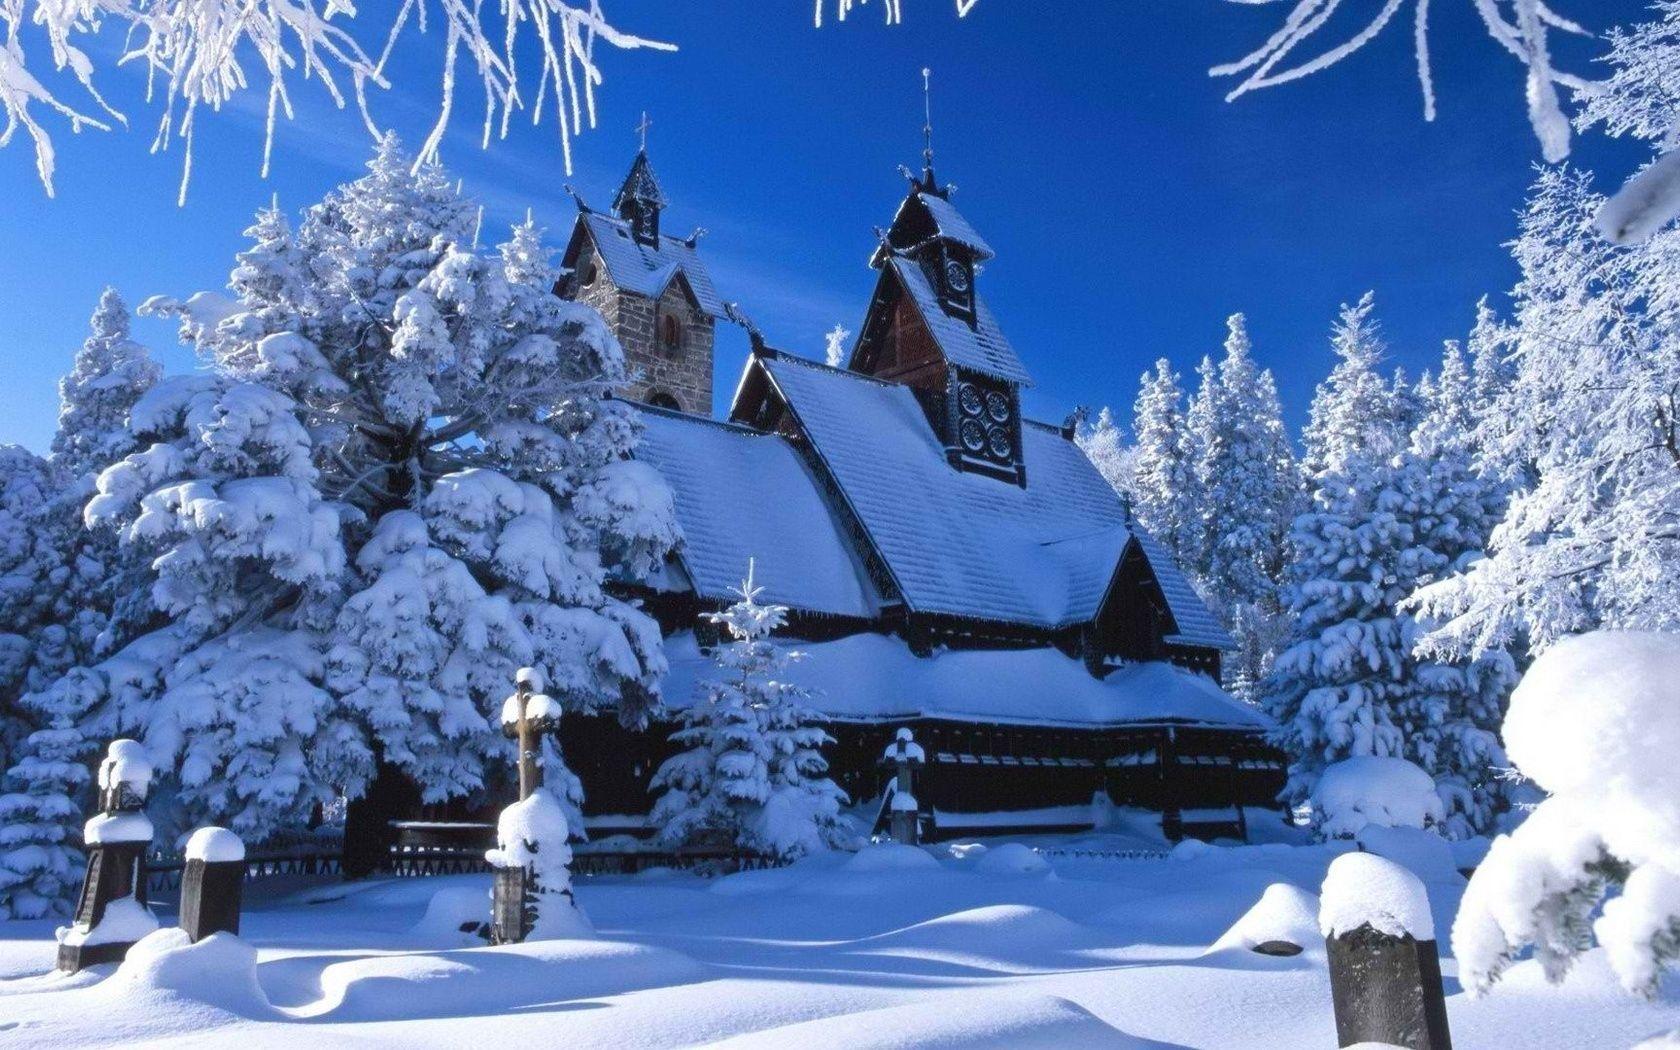 hiver_telecharger_paysage-hd-fond-ecran_4